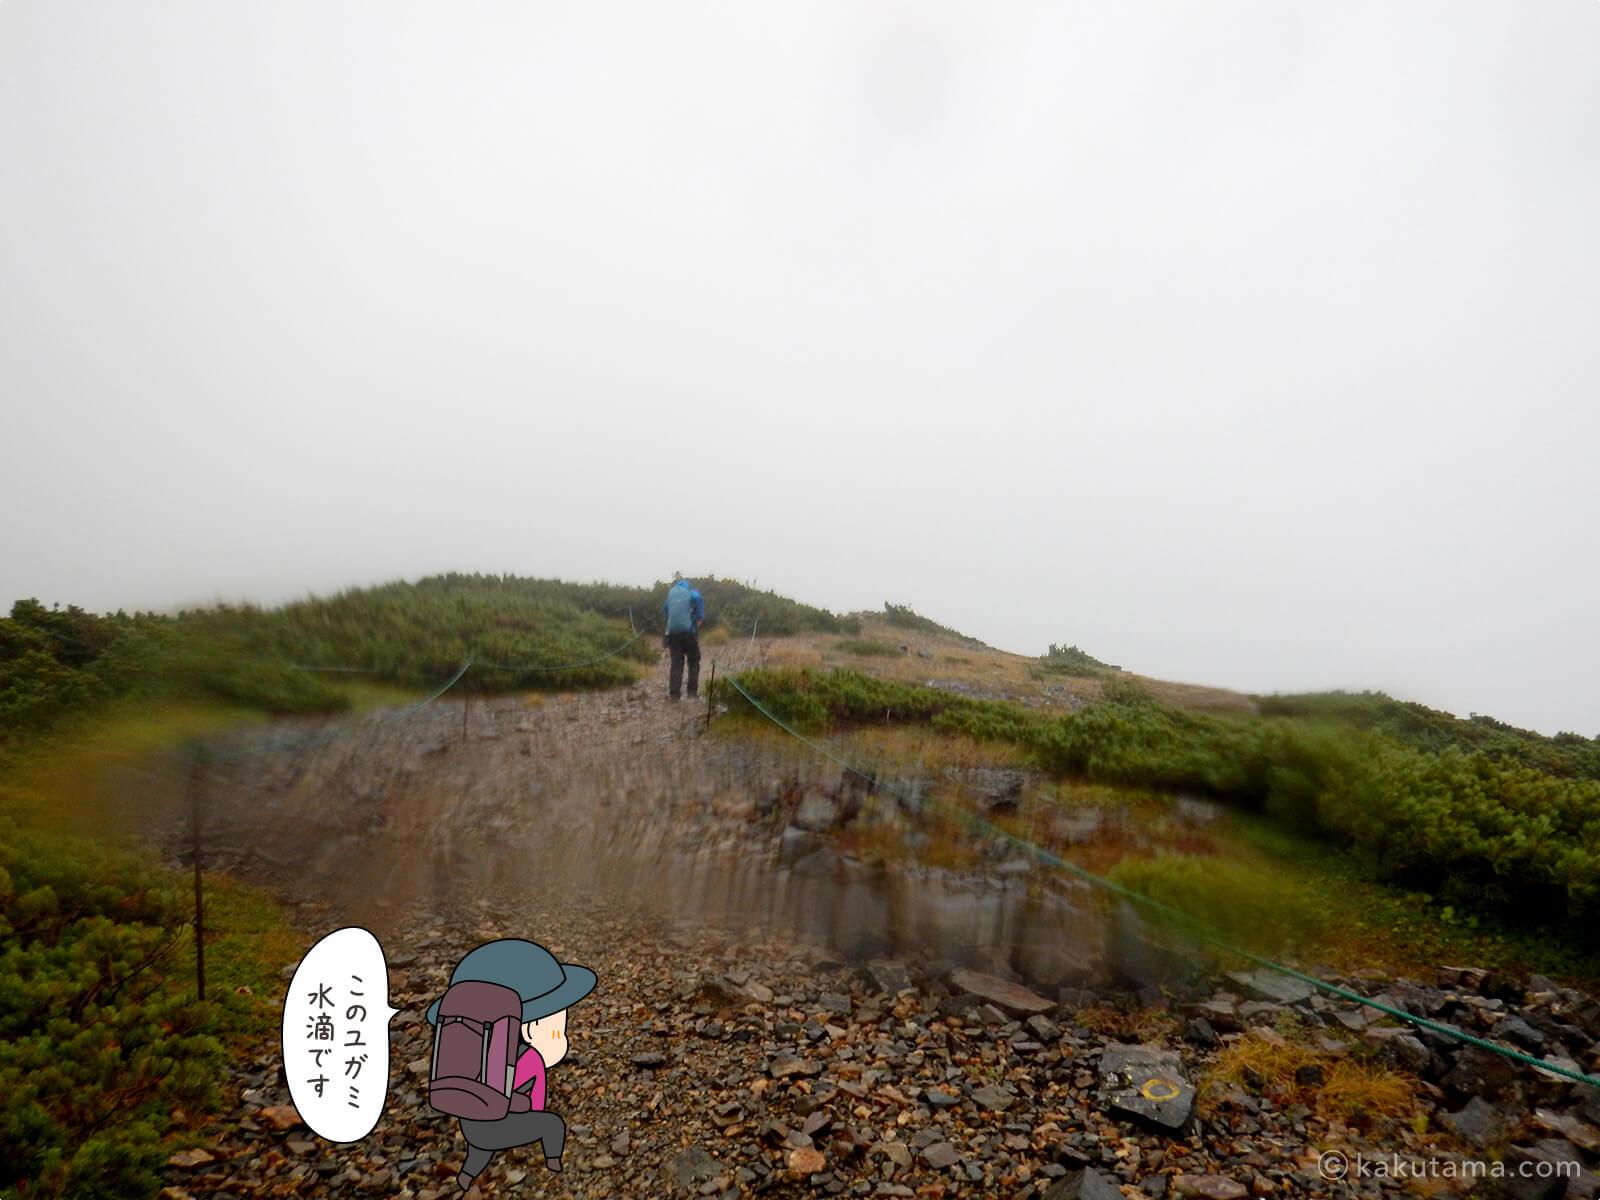 白馬大池山荘から登山開始